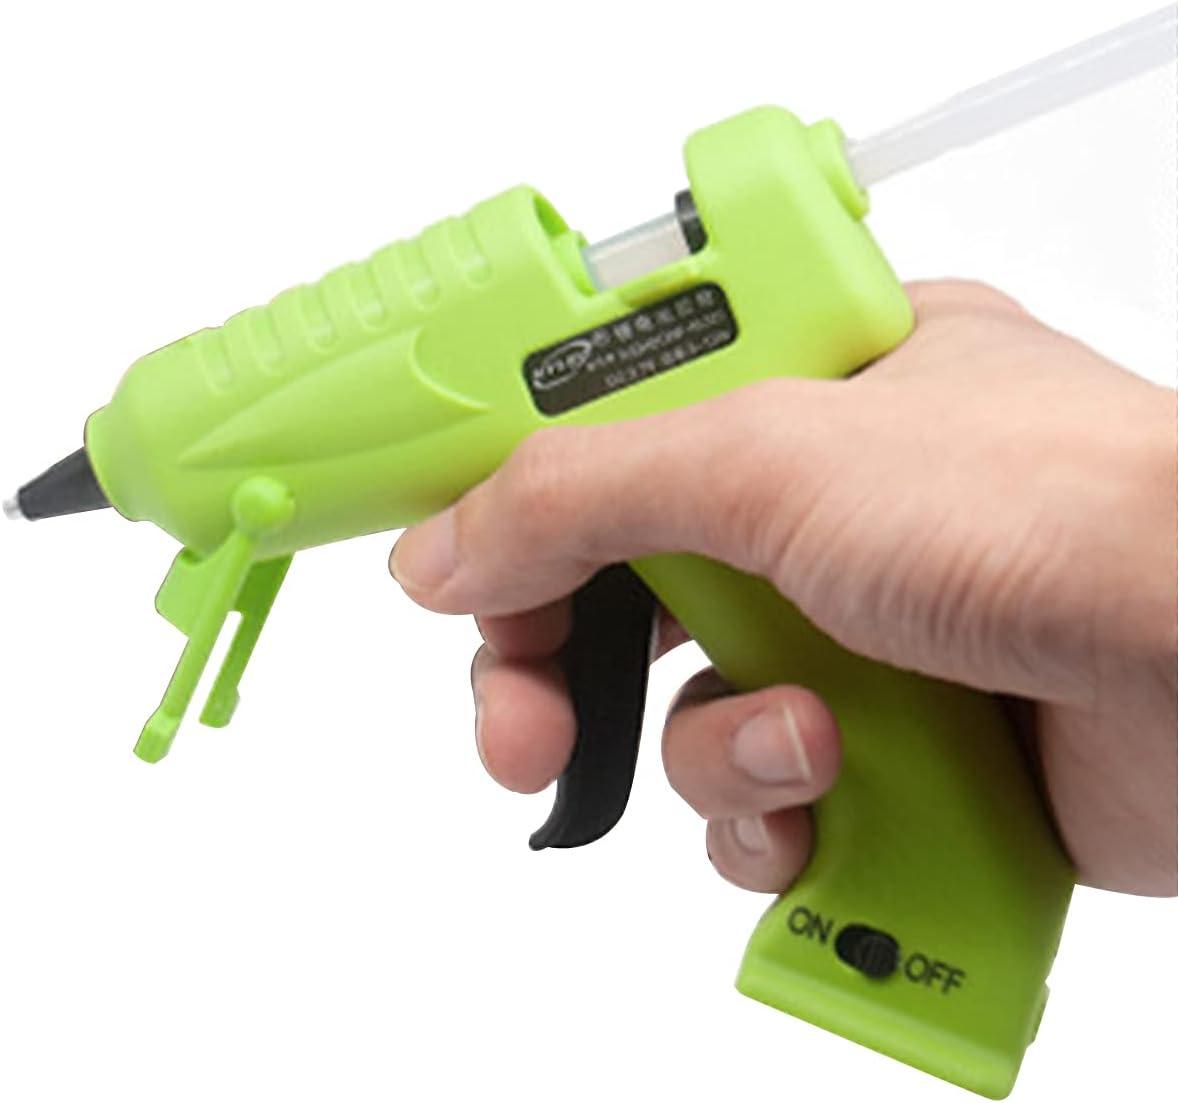 Hot Melt Max 74% OFF Glue Gun Chacerls Wireles Surprise price USB Silicon Recharge